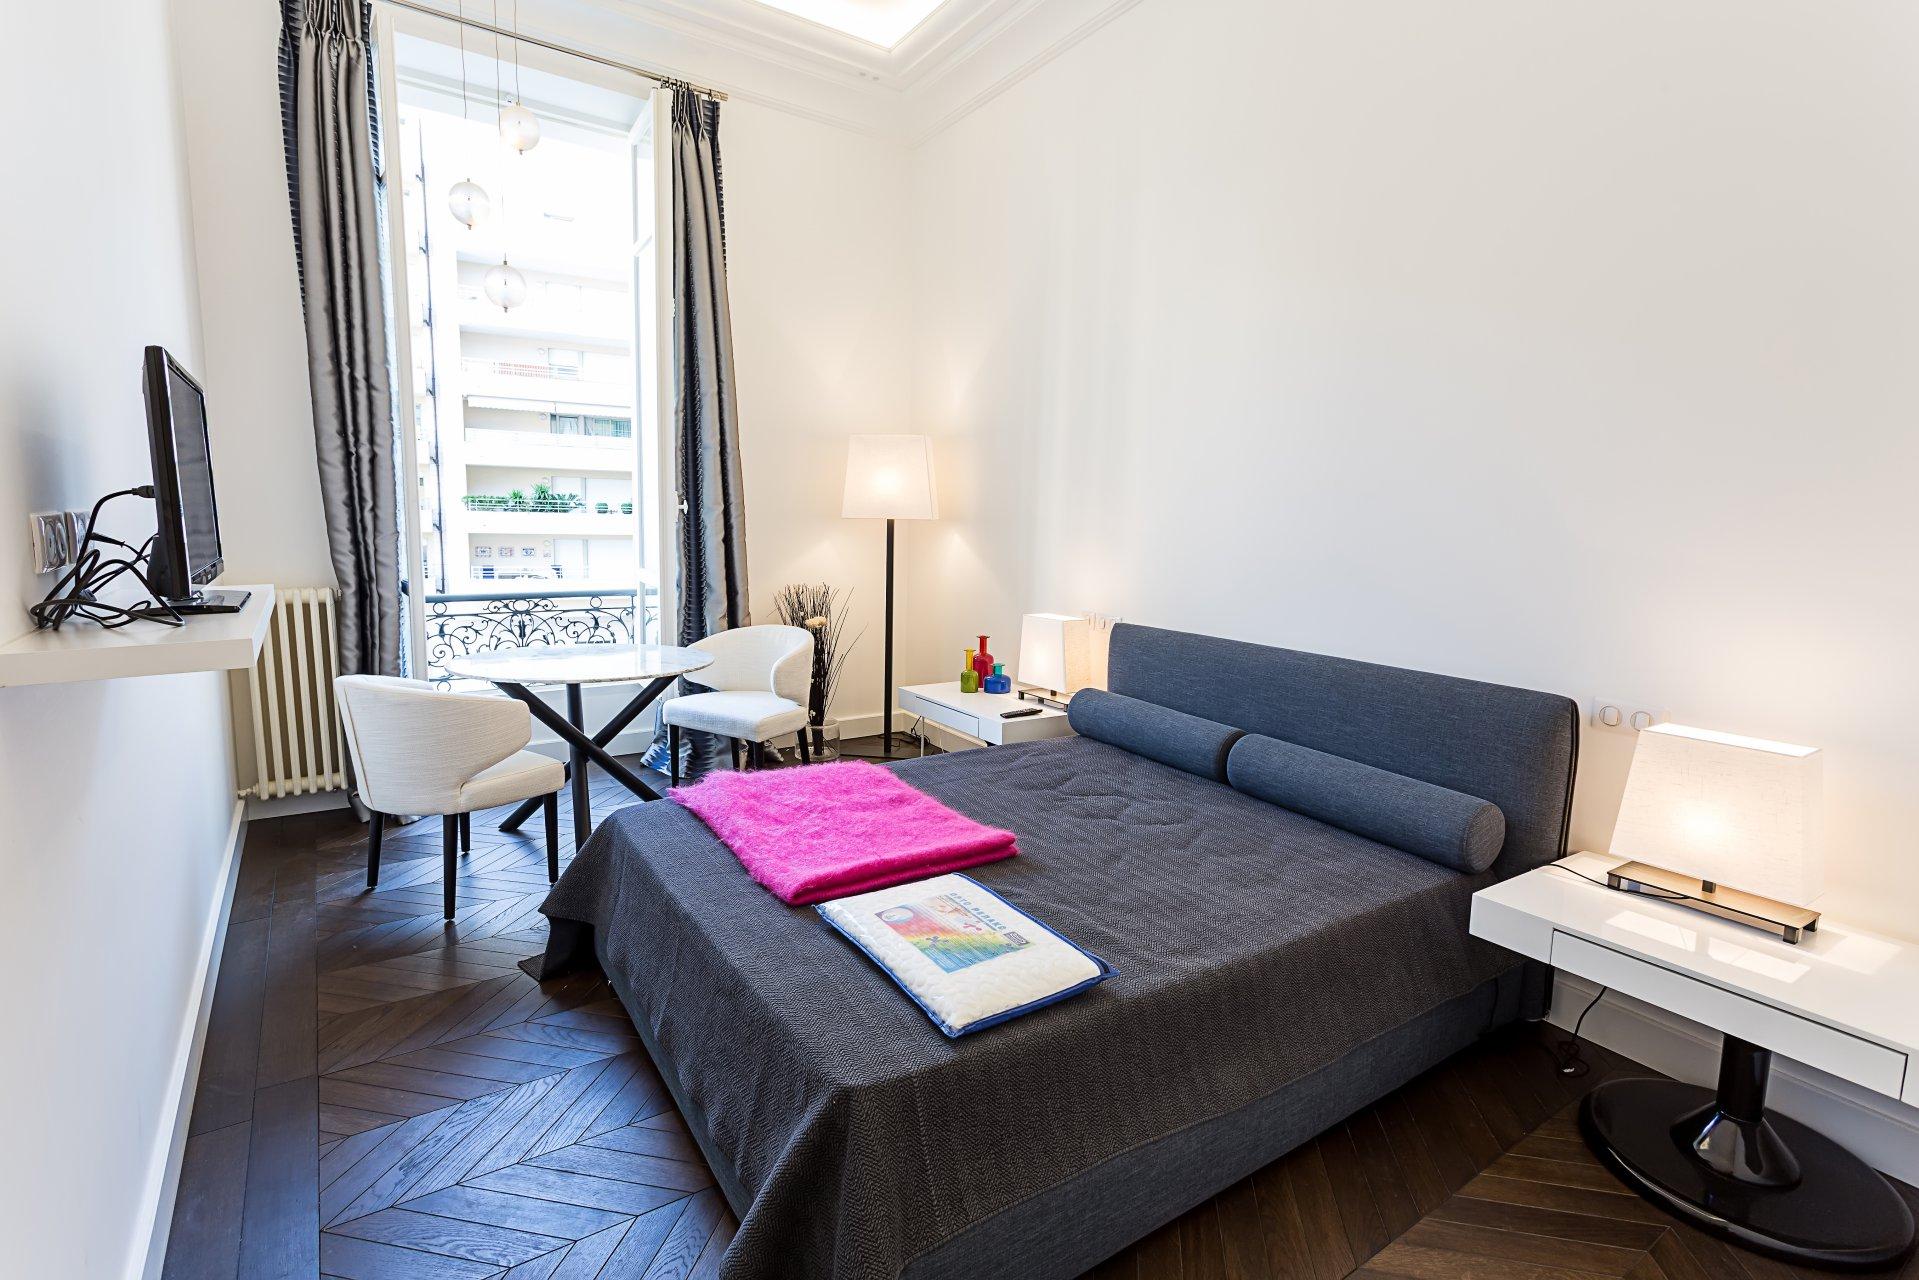 140 m² near the beach - center of Nice - quiet